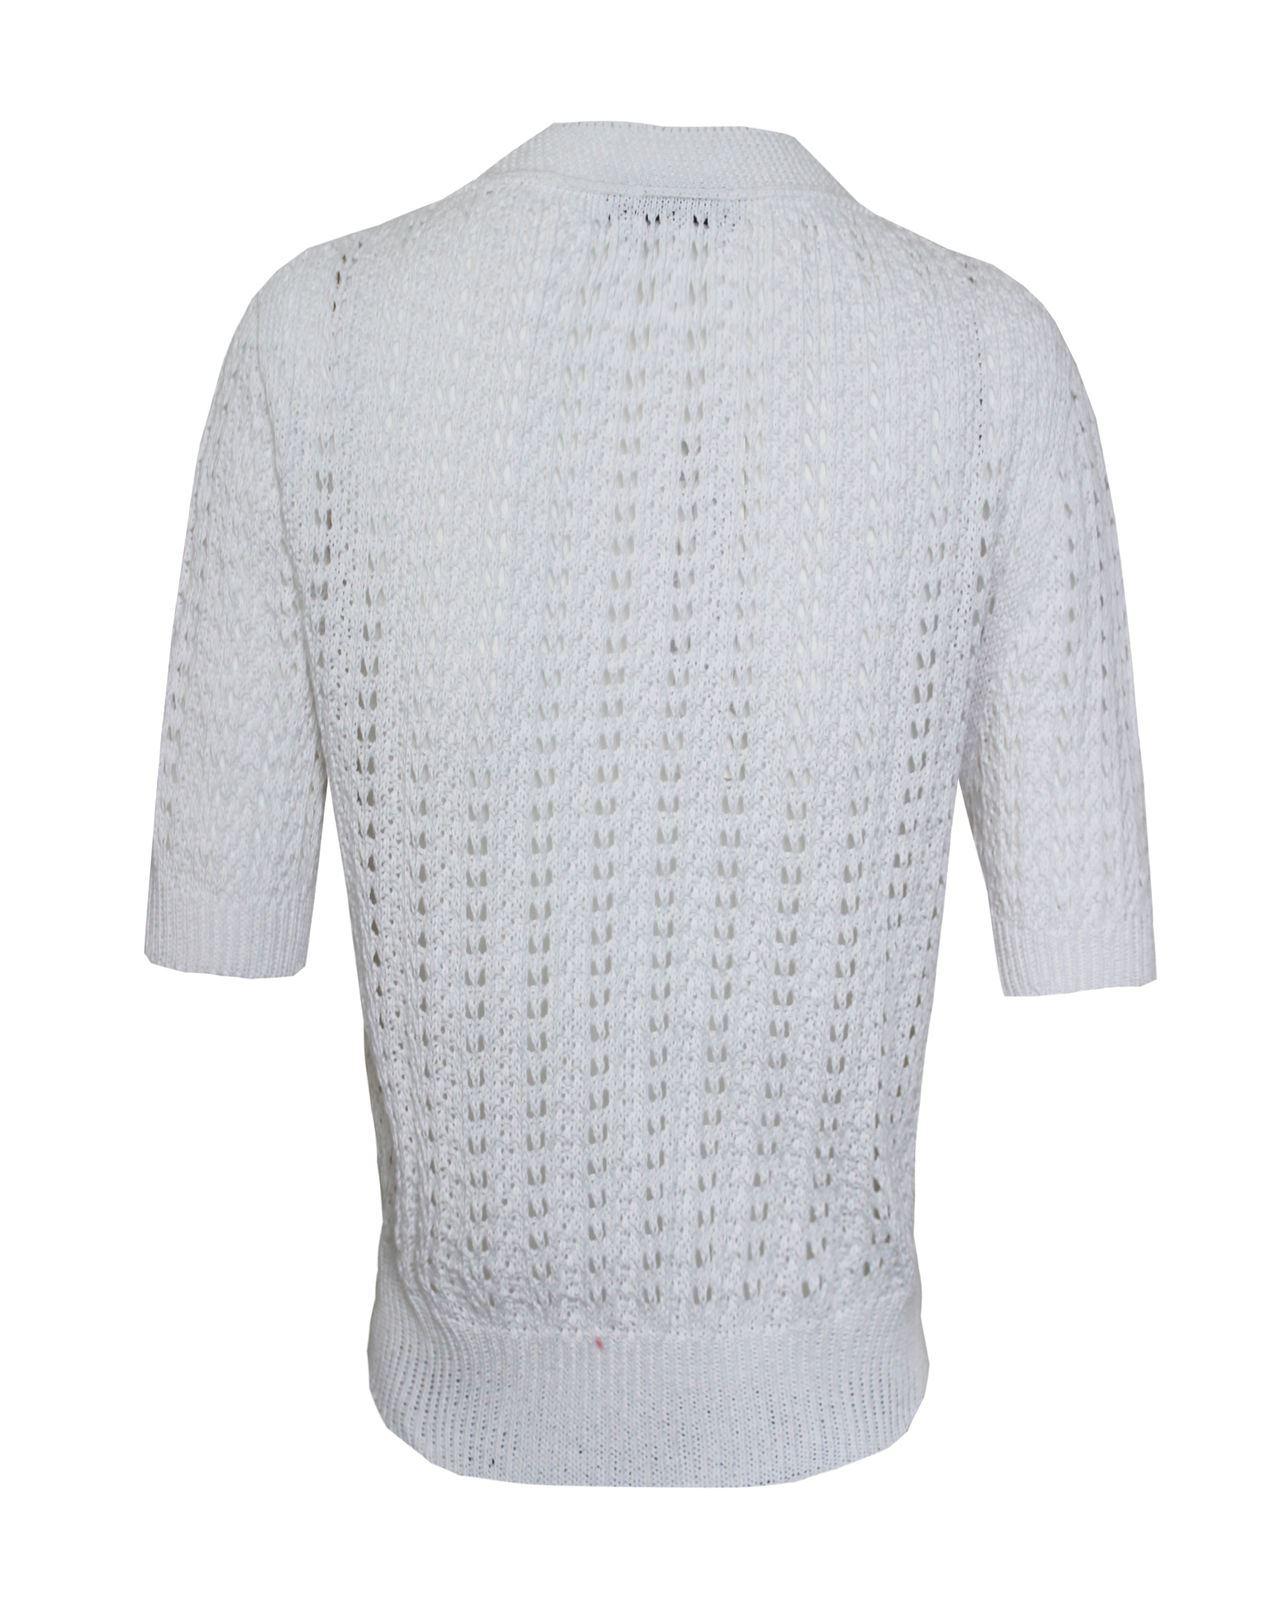 Mesdames-crochet-tricote-pour-femme-manches-courtes-hausser-brooched-cardigan-crop-top-8-14 miniature 20